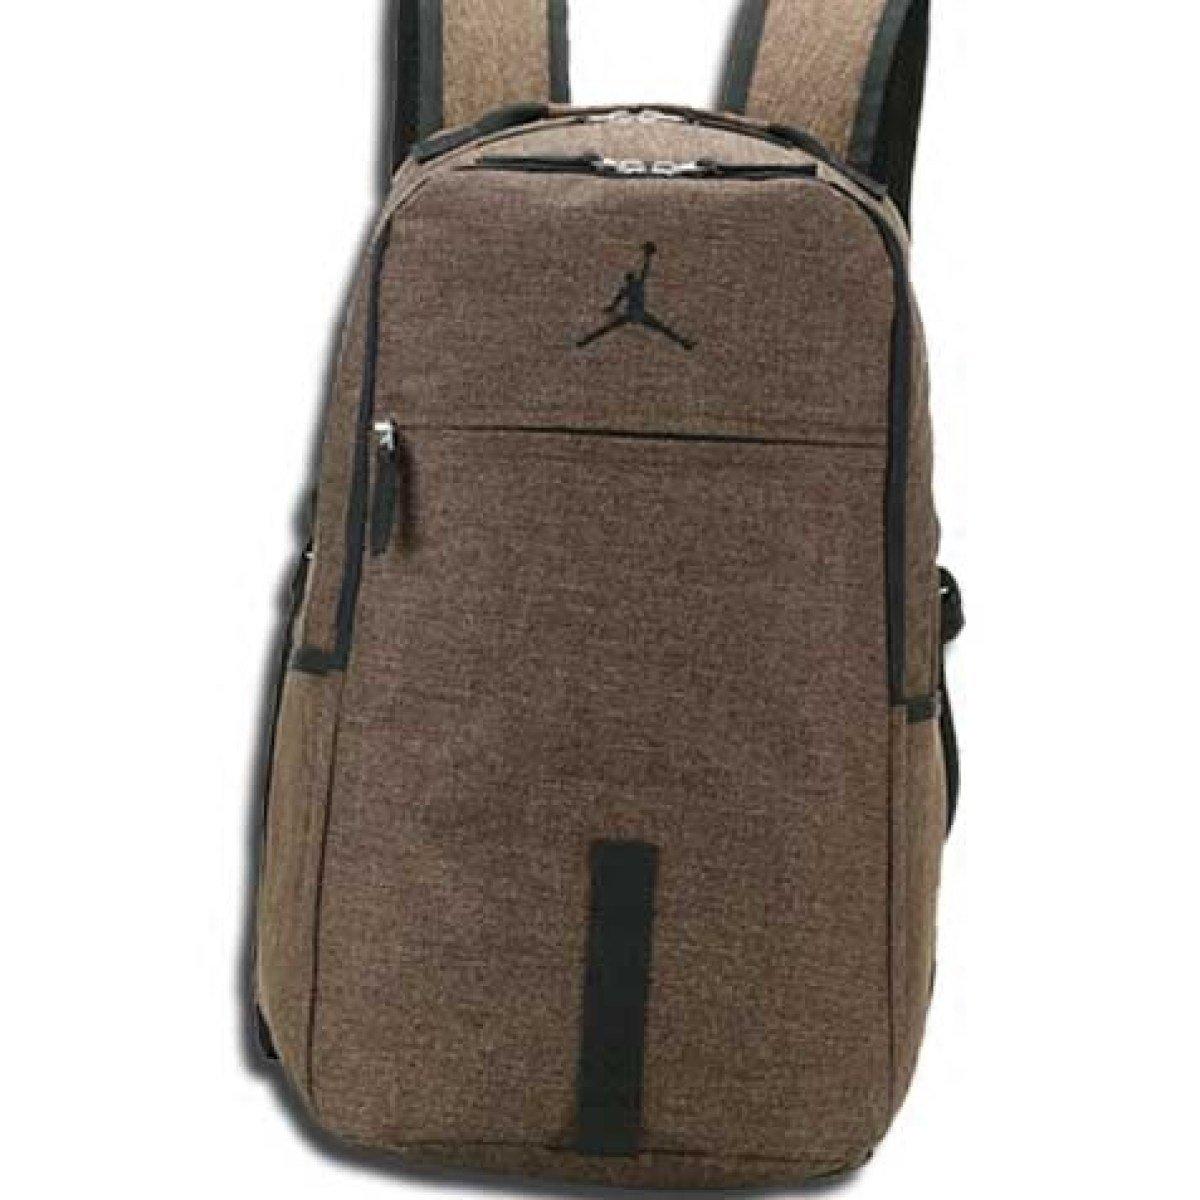 Brown One Size Student Bag Fashion Waterproof Computer Bag Outdoor Travel Shoulder Bag